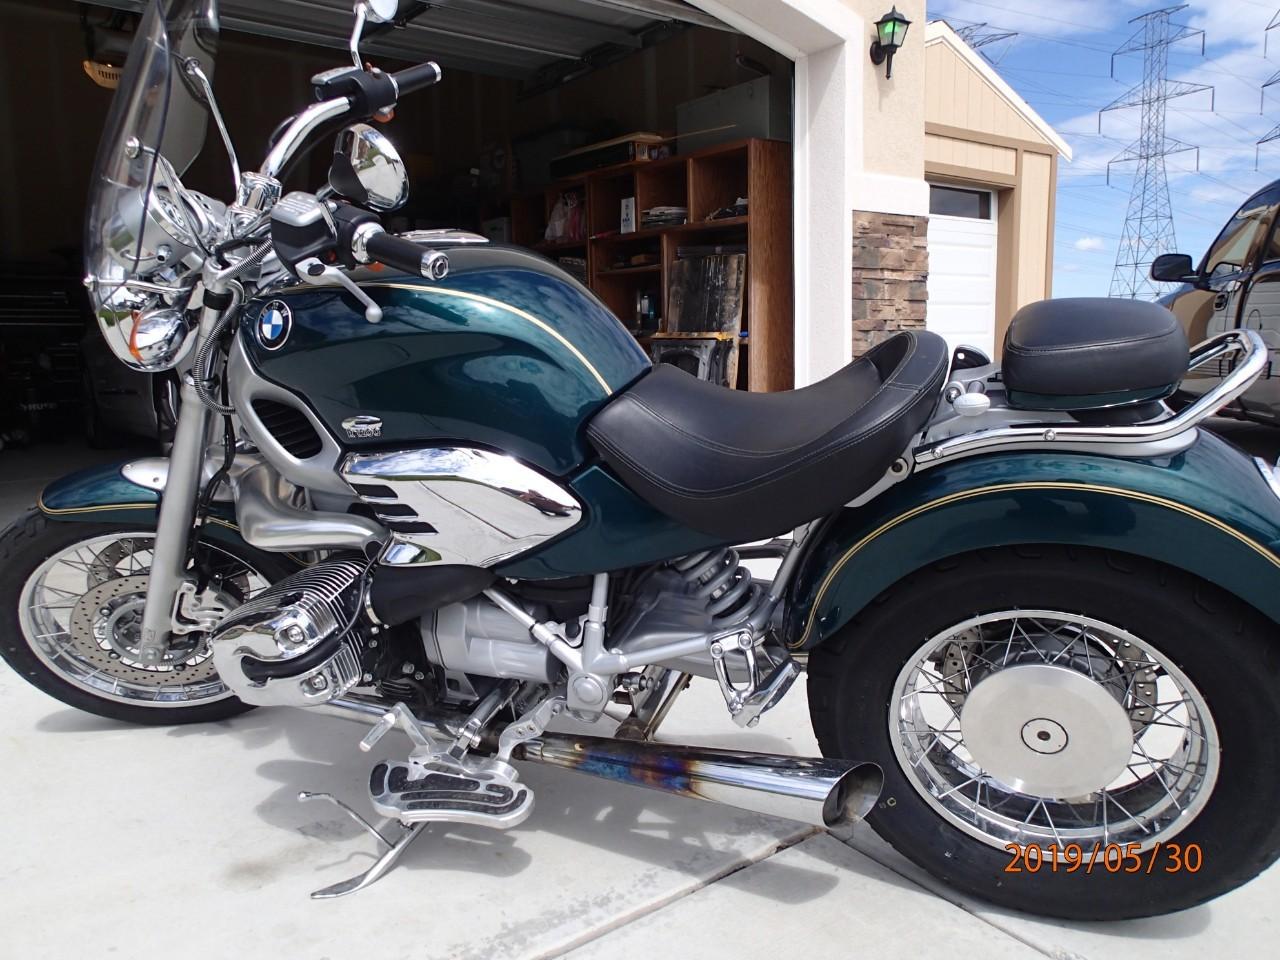 Utah s for sale s motorcycletrailers snowmobile trader